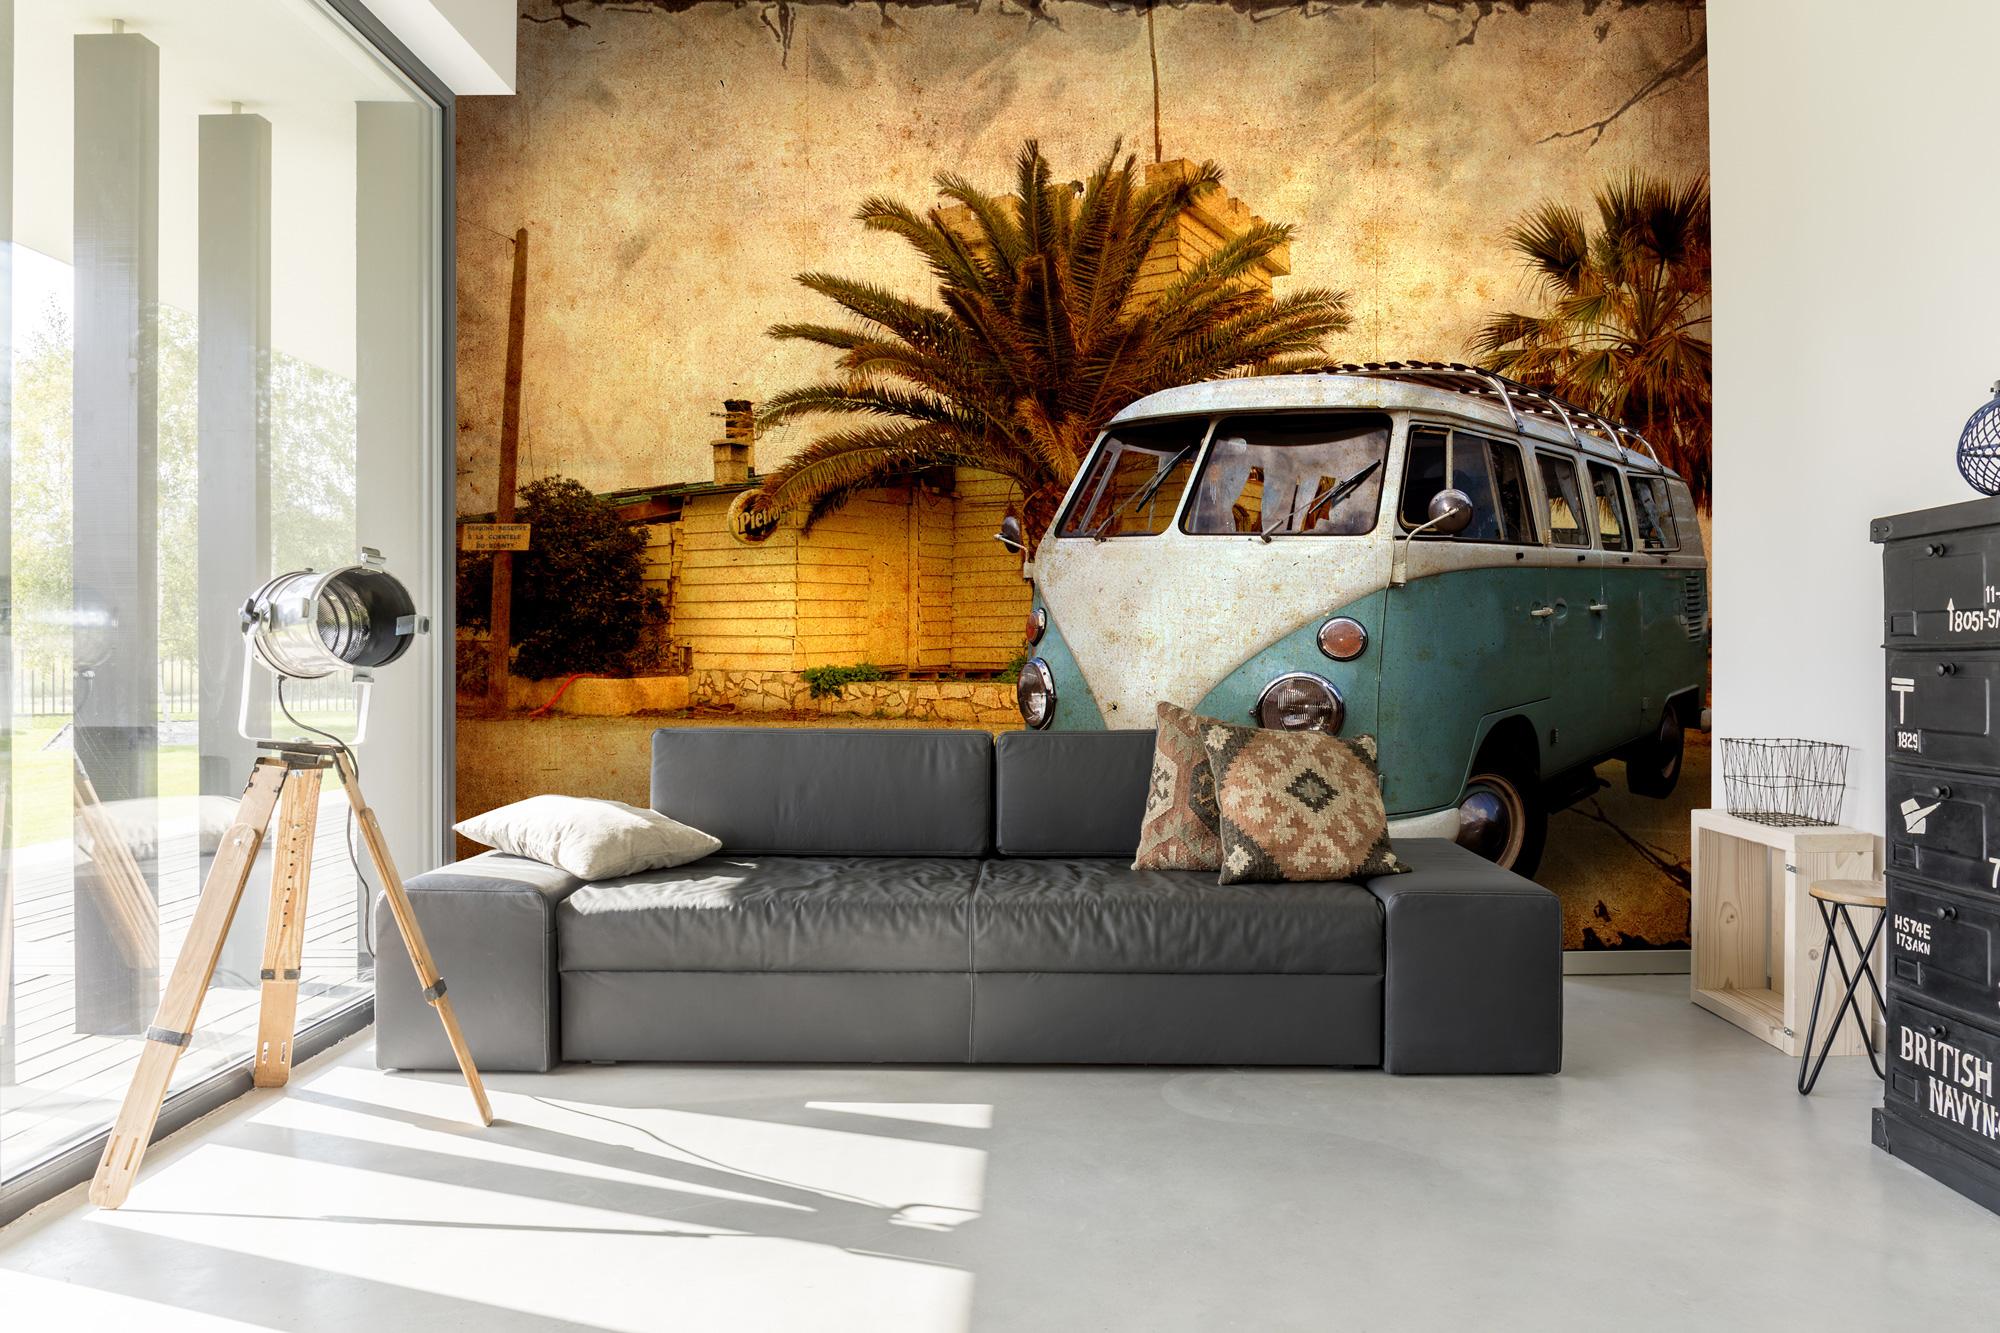 Retro Wallpaper For 60s And 70s Home Decor